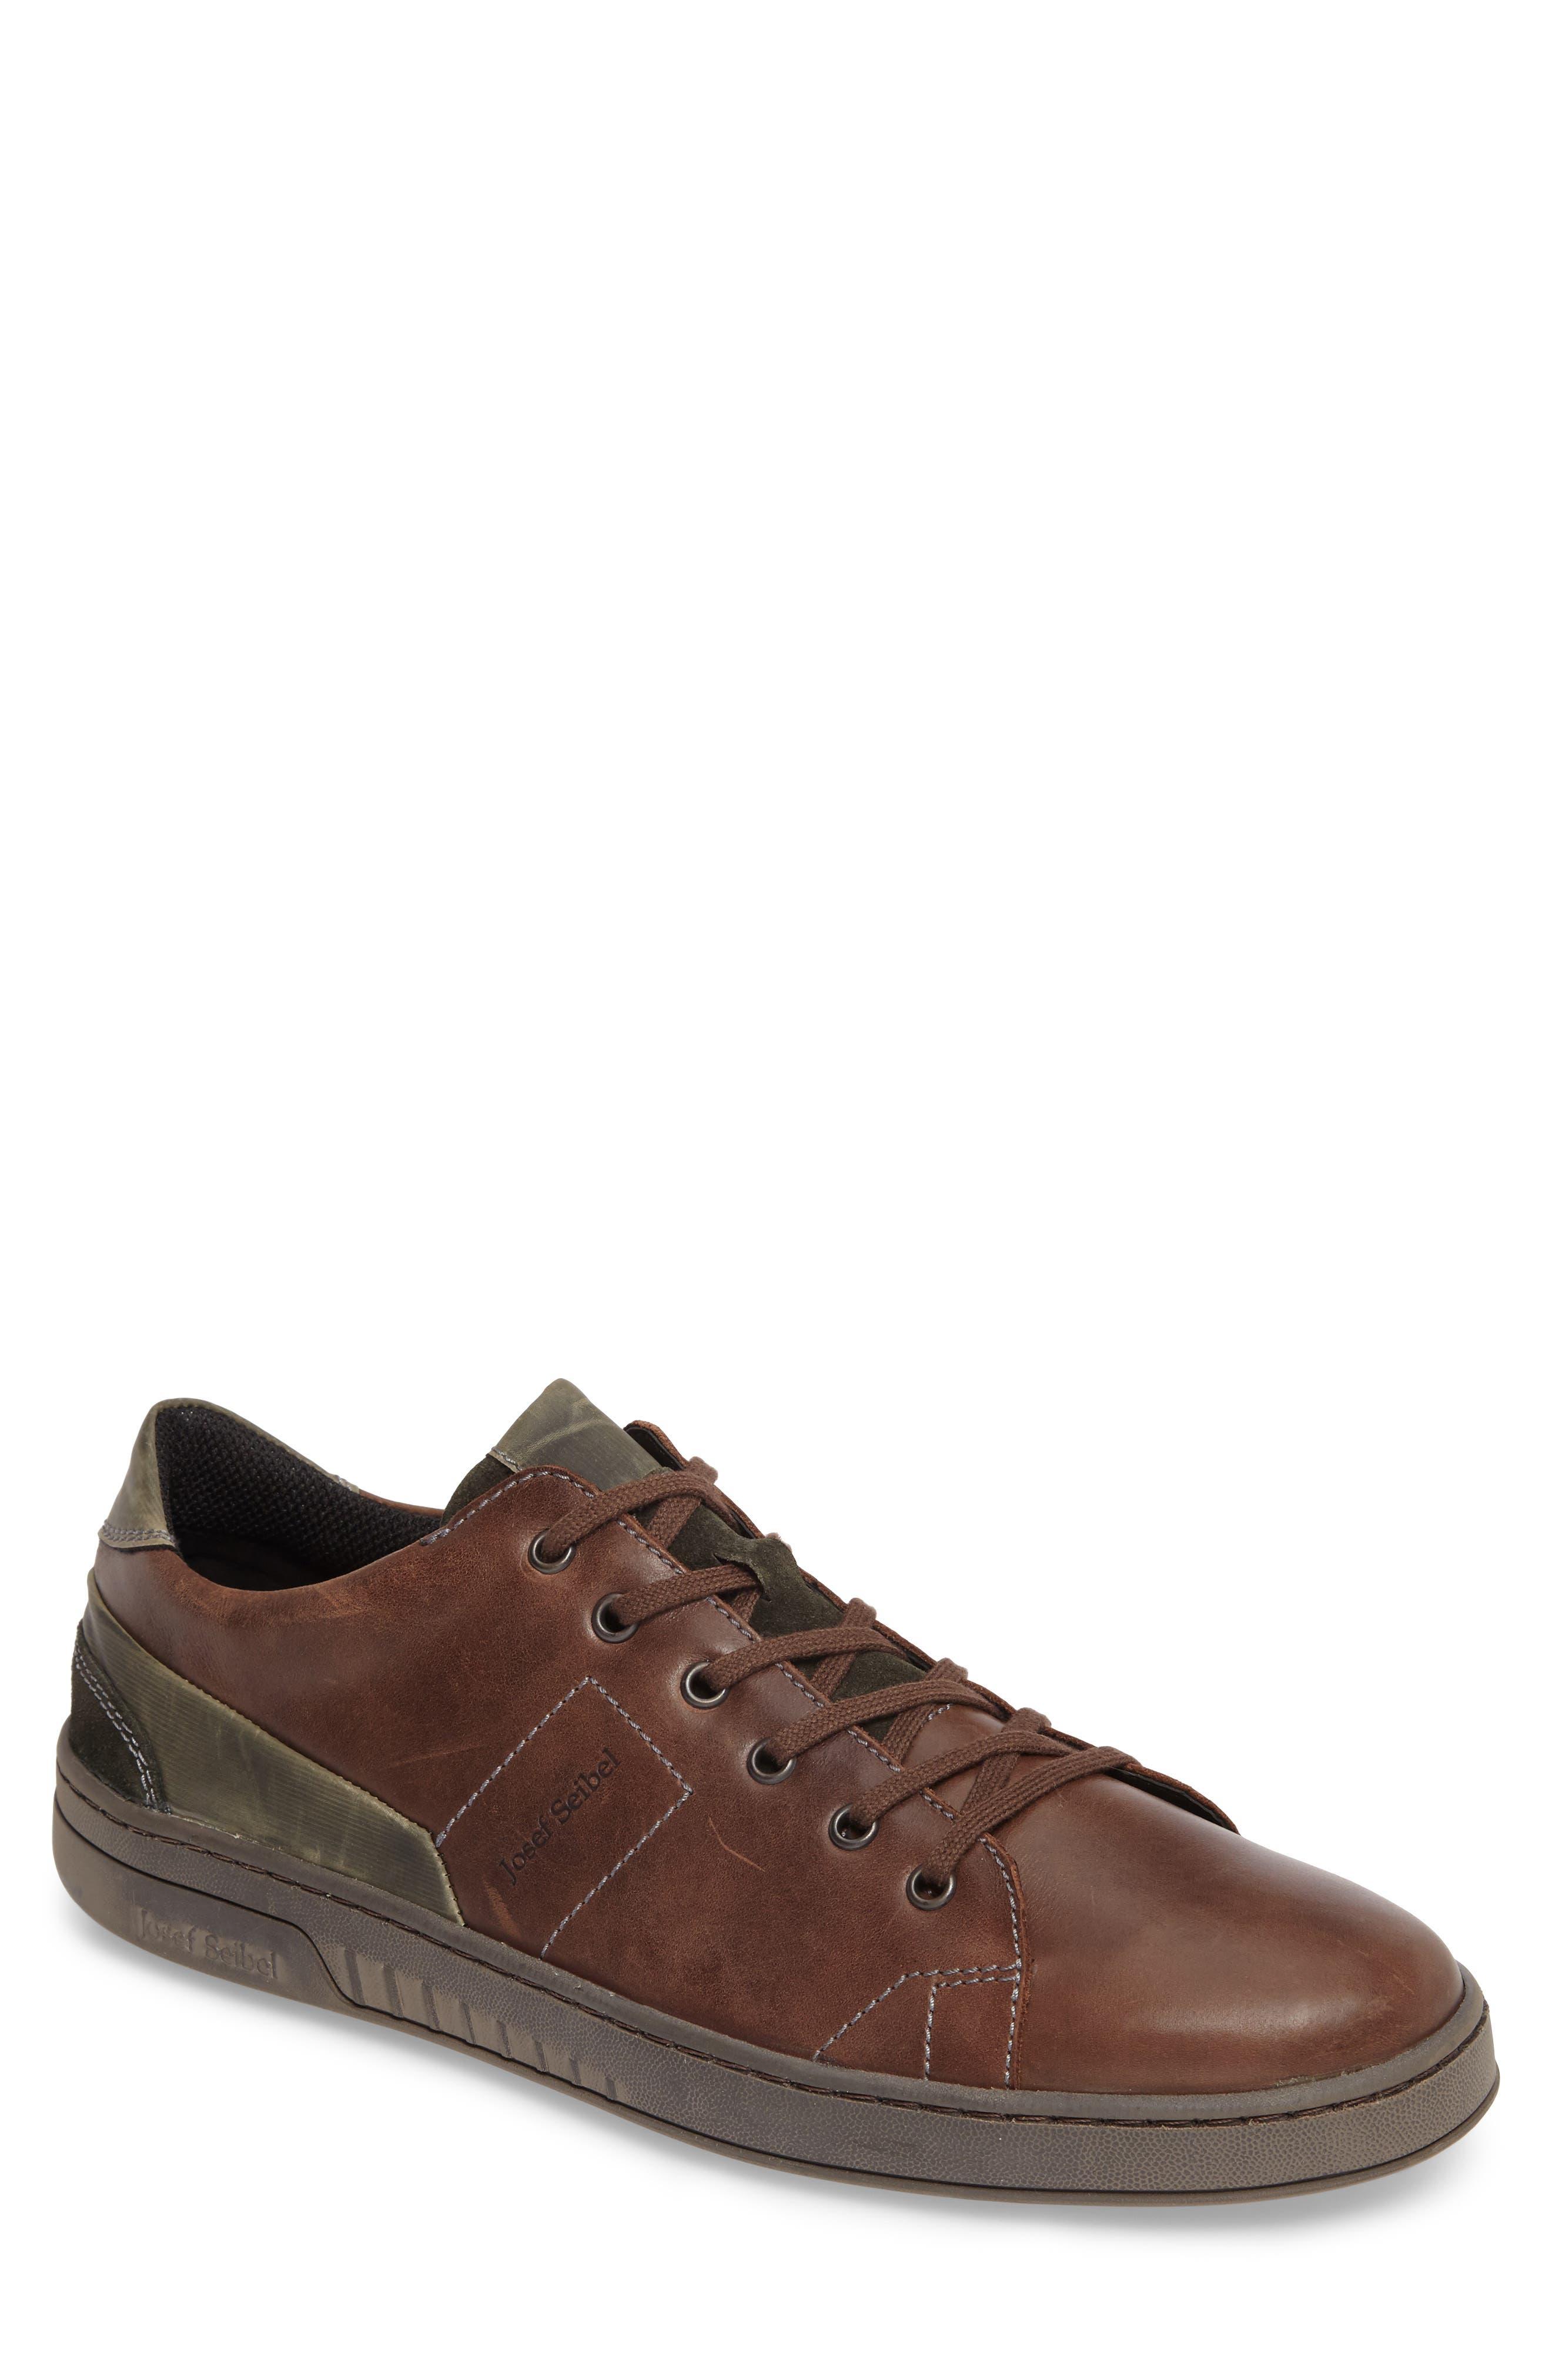 Josef Seibel Dresda 23 Sneaker (Men)